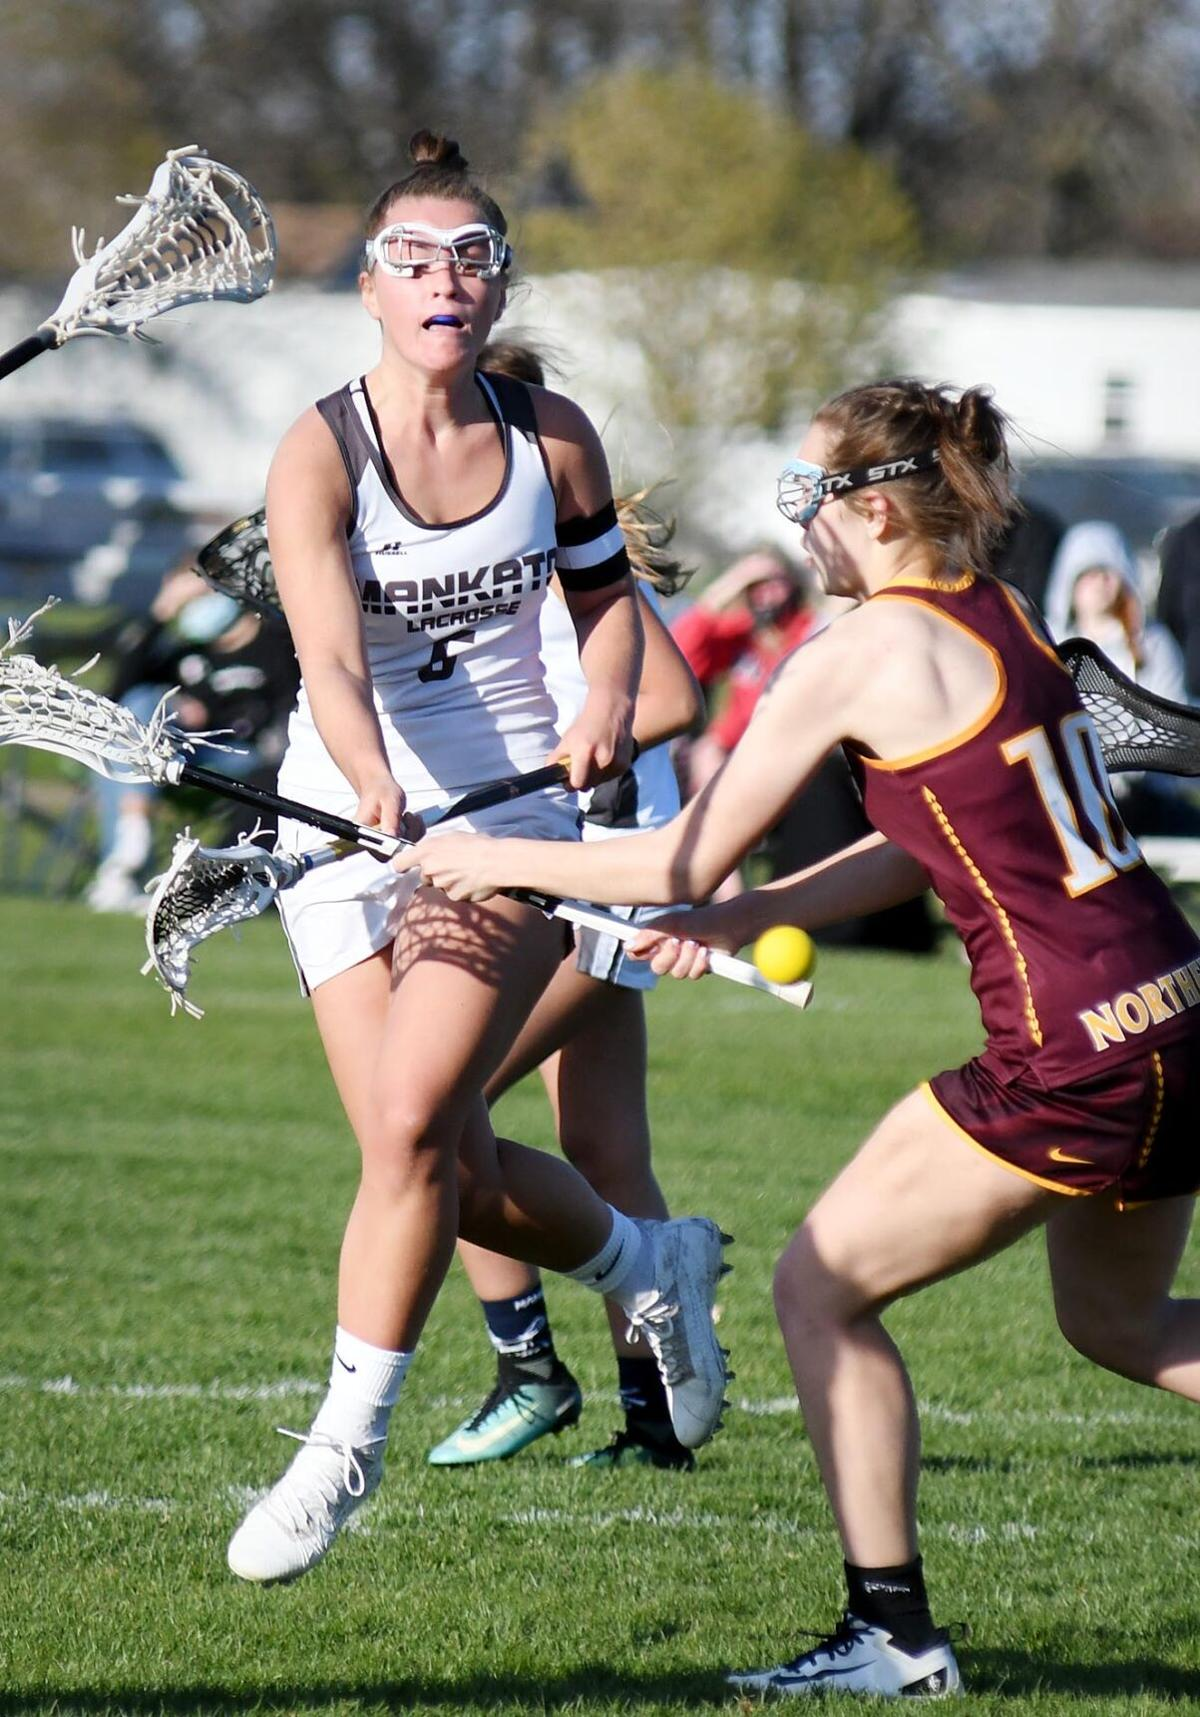 Mankato girls lacrosse vs. Northfield 1